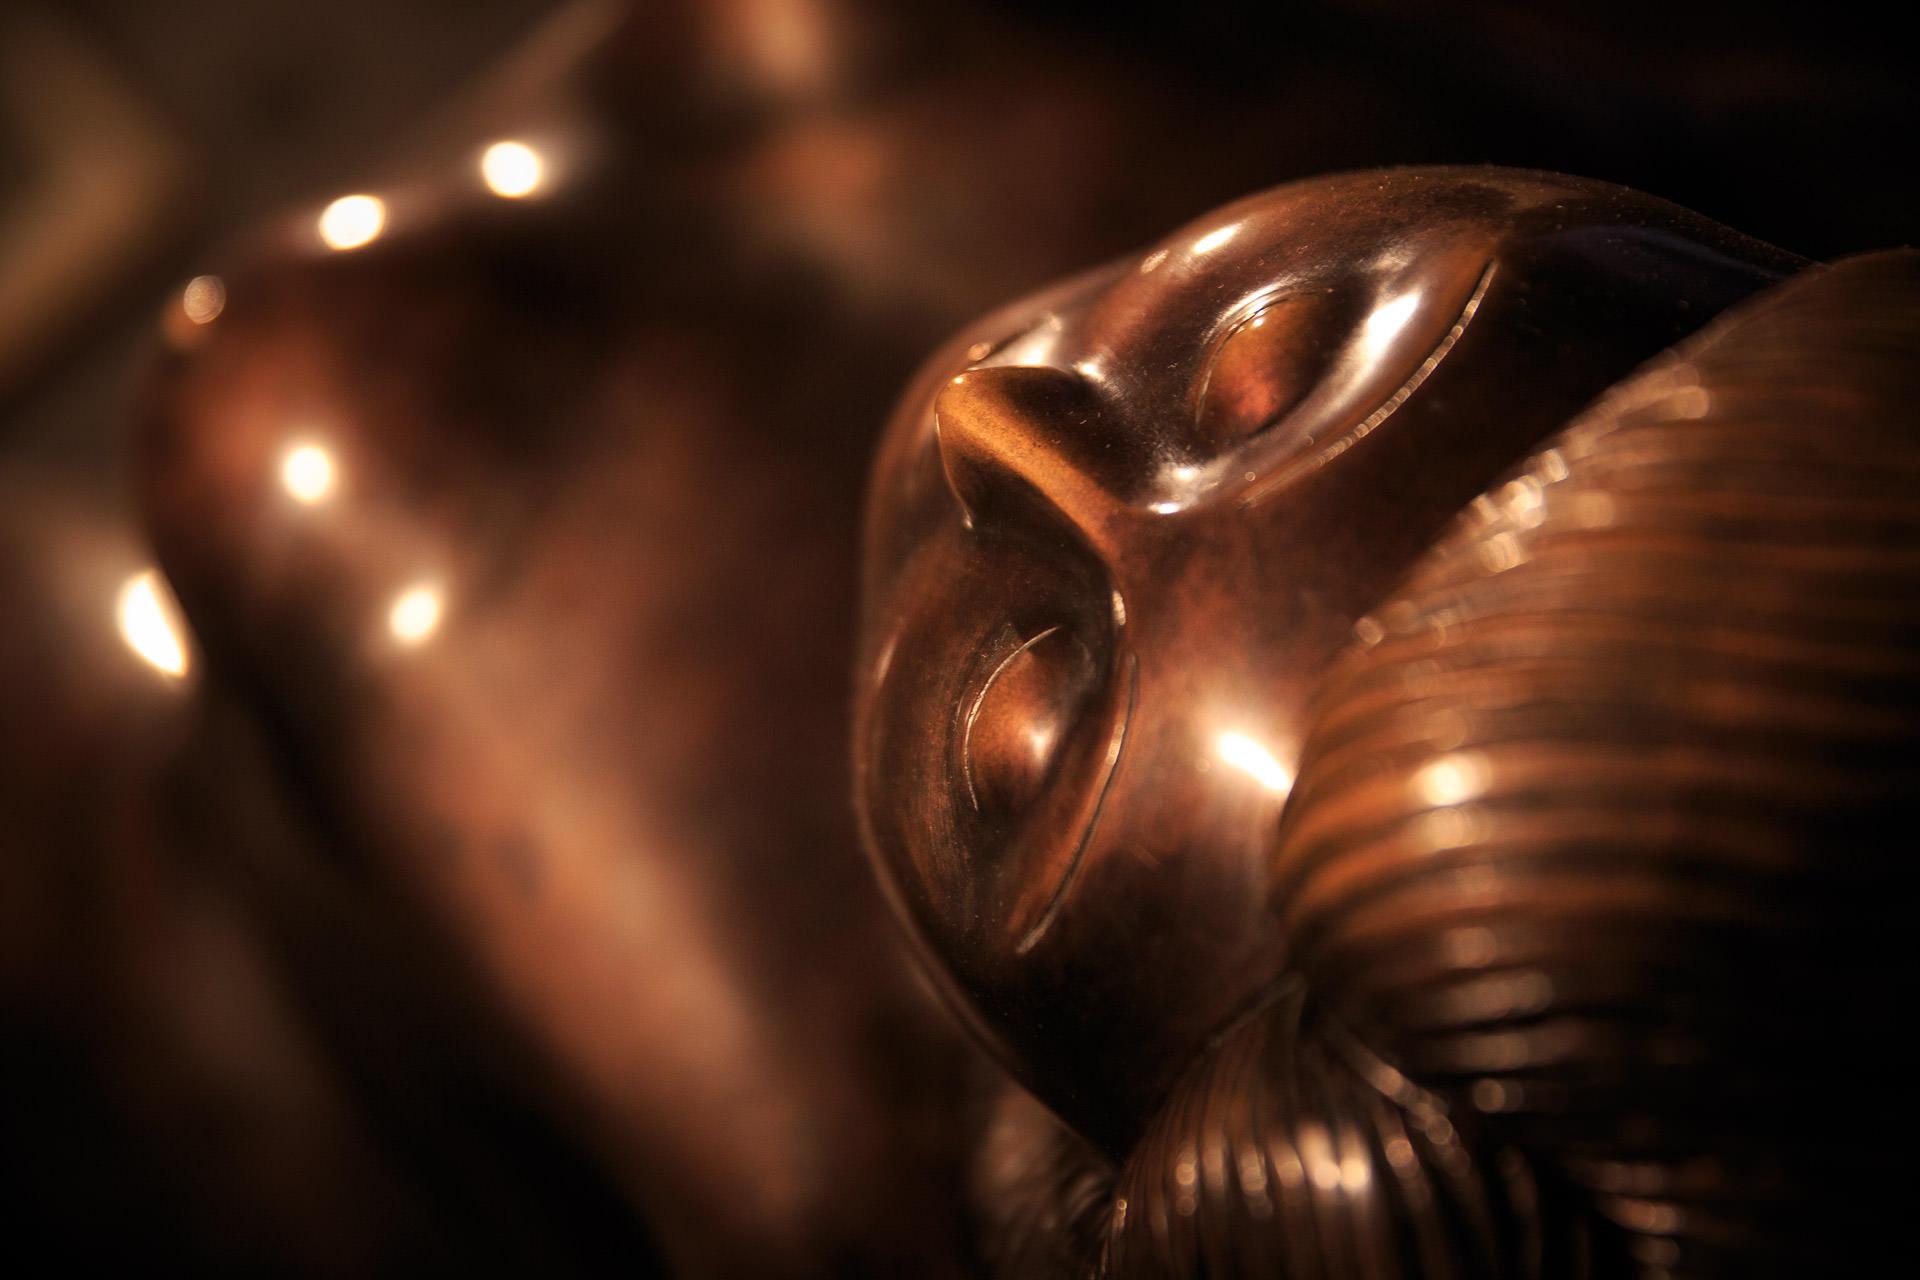 bogota candelaria museo botero cundinamarca colombia © Tristan Quevilly